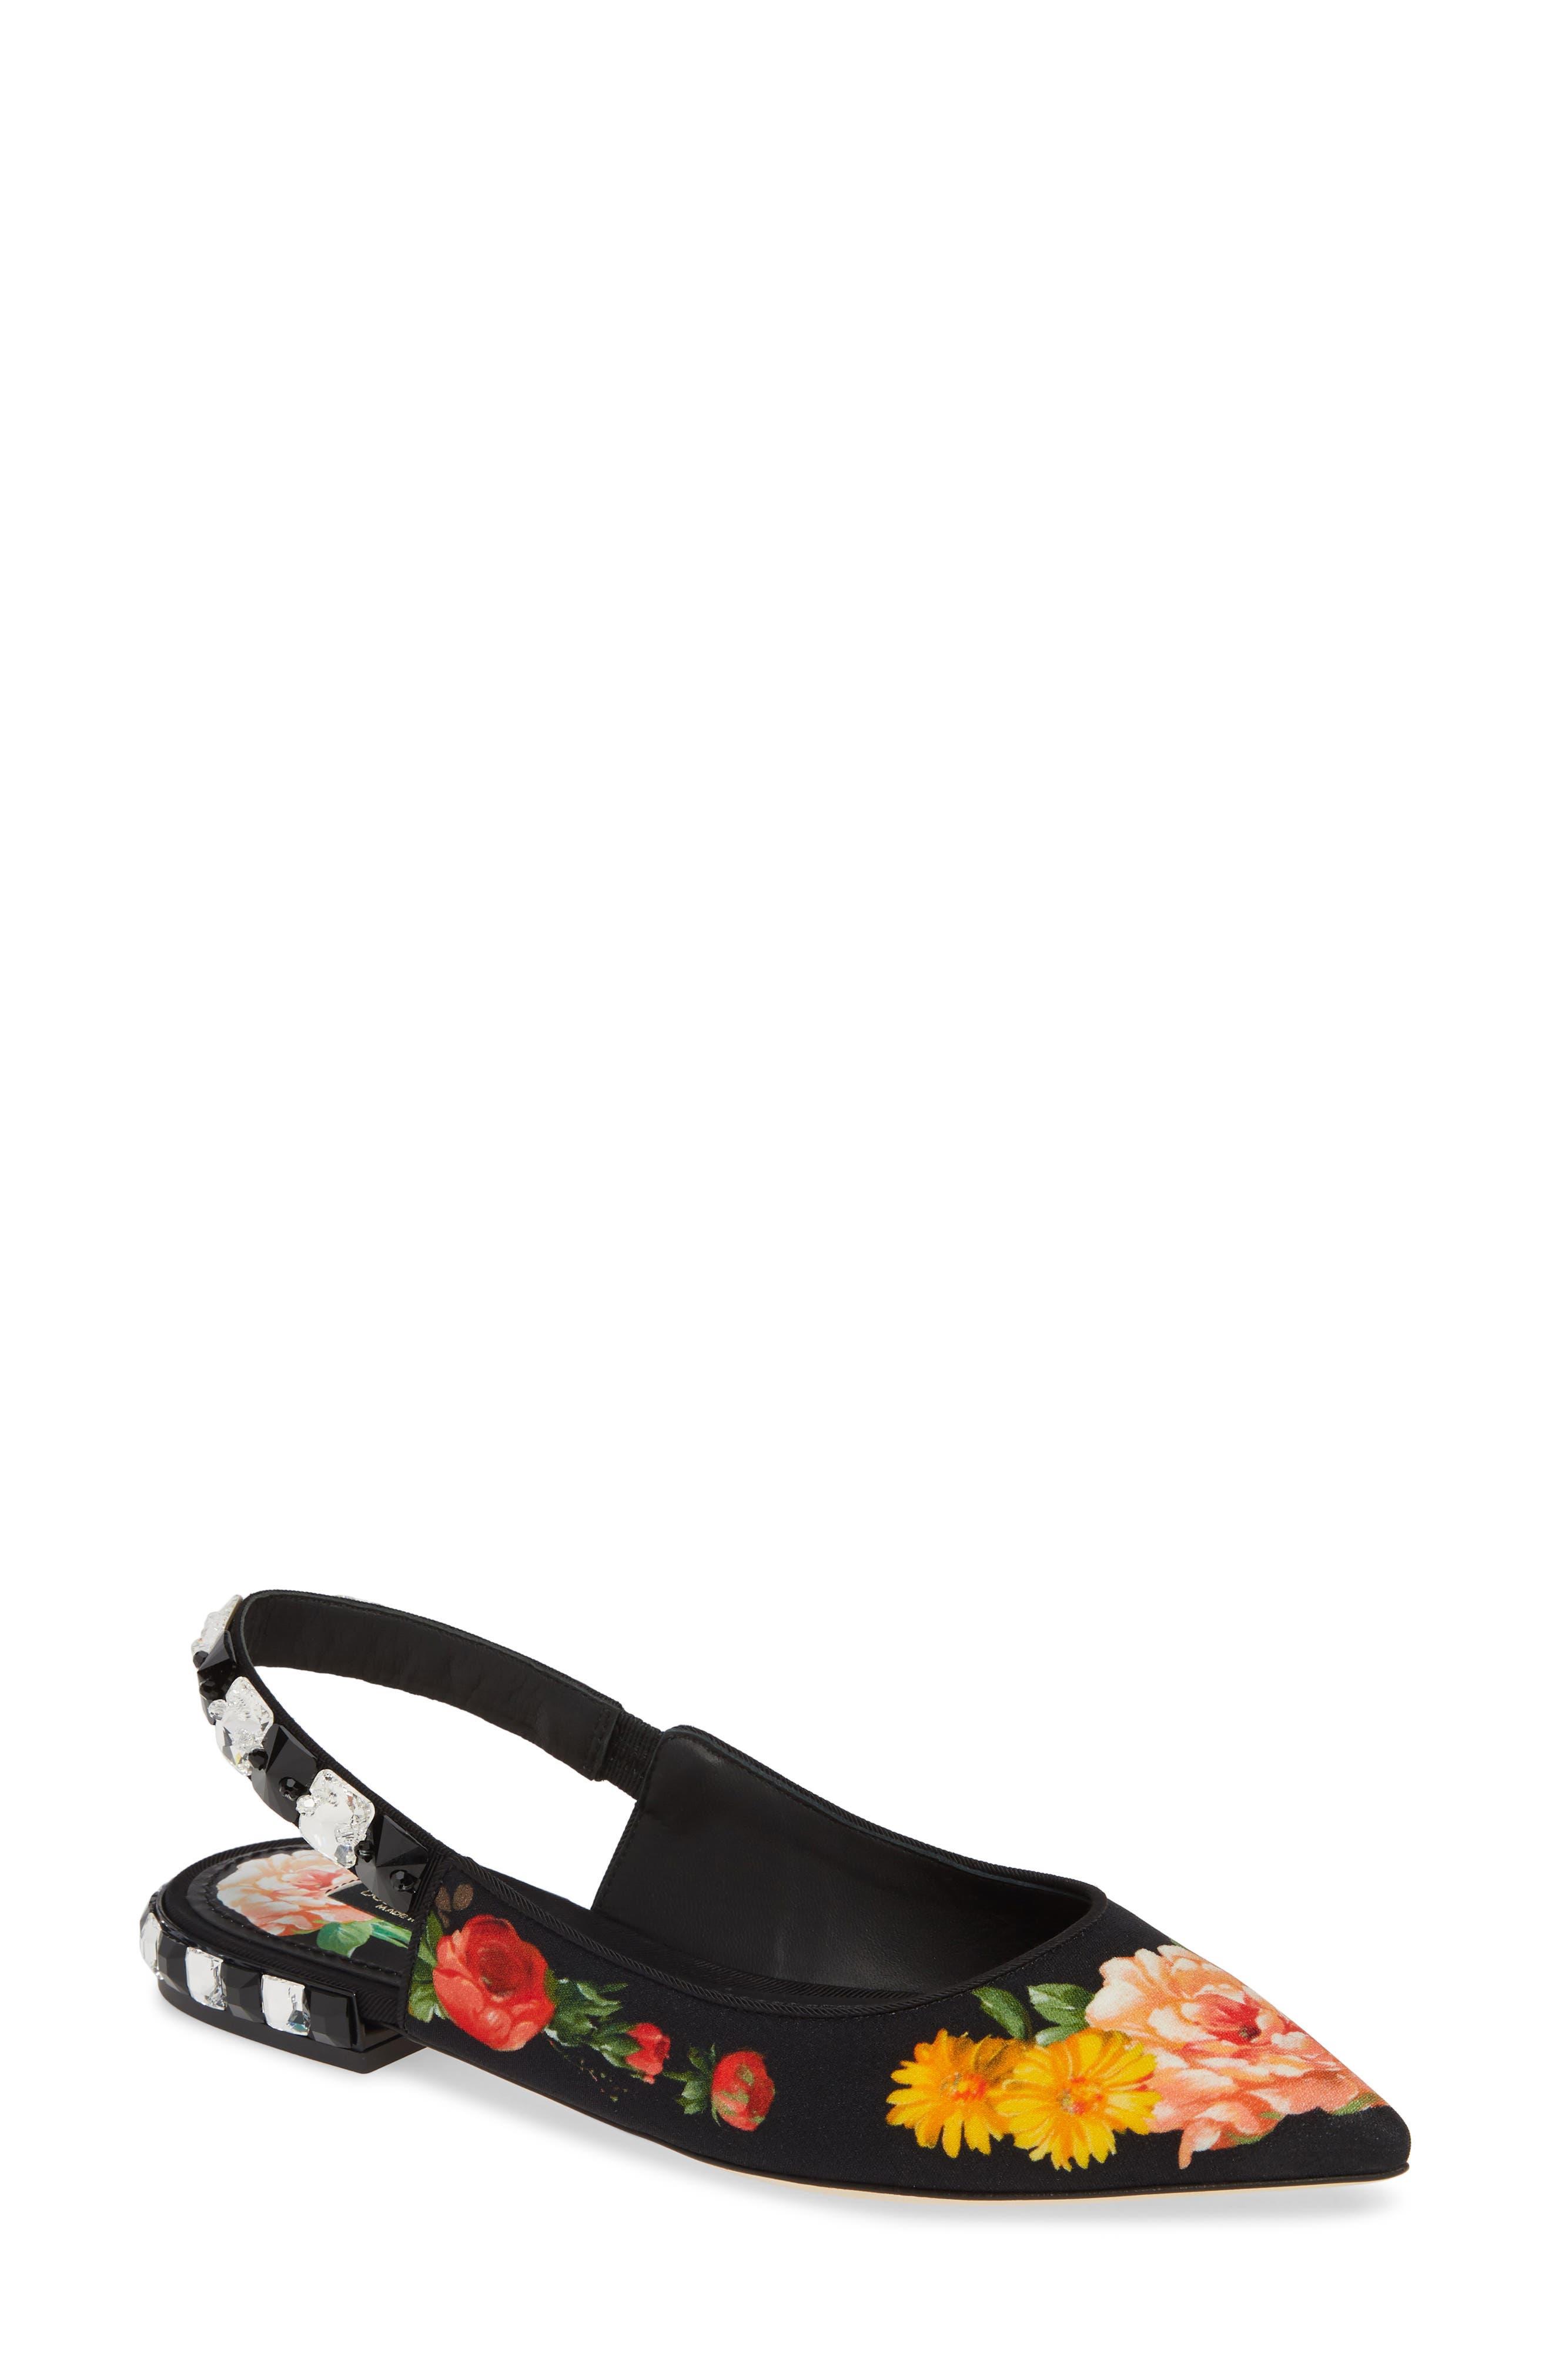 DOLCE&GABBANA Floral Print Slingback Flat, Main, color, FLORAL PRINT